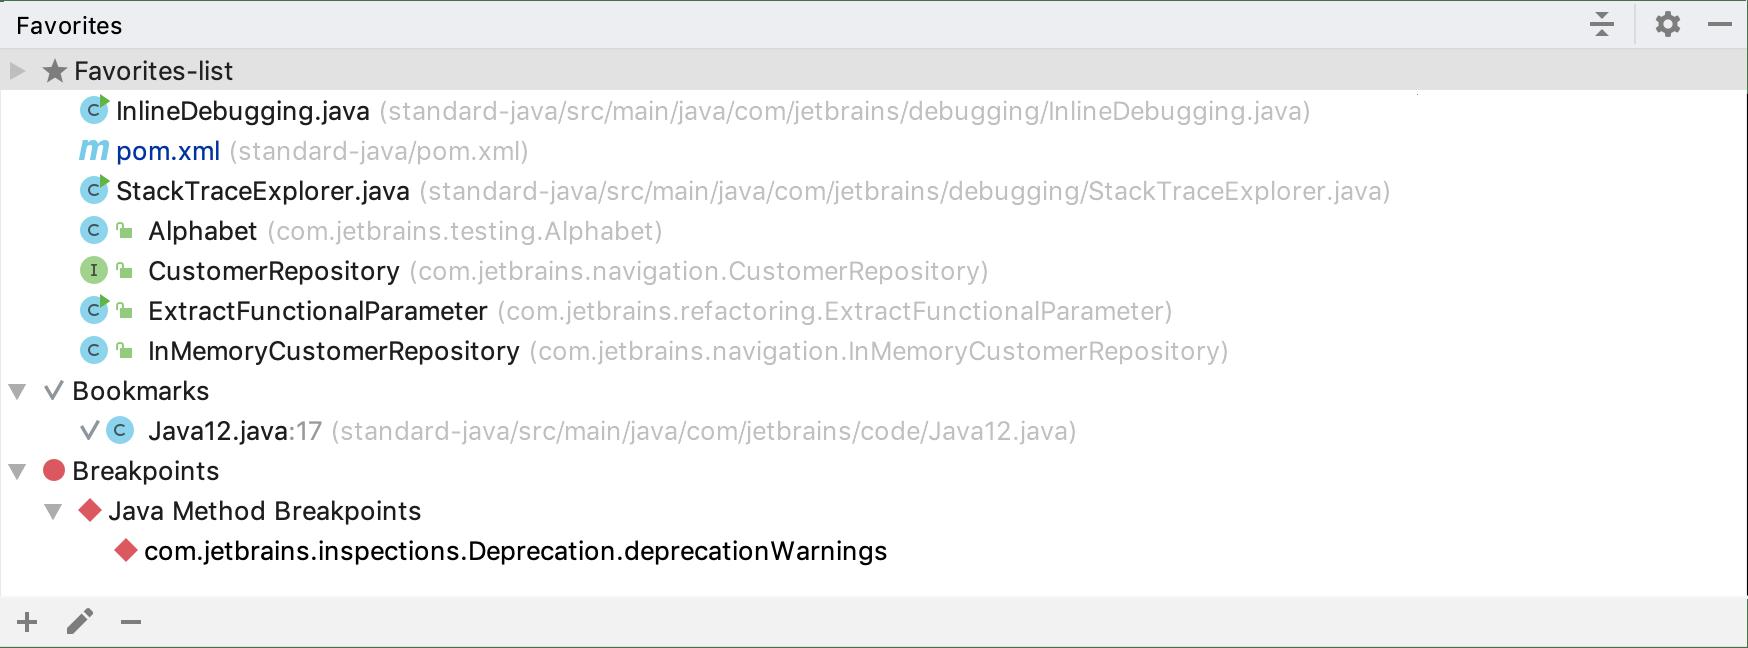 Favorites tool window